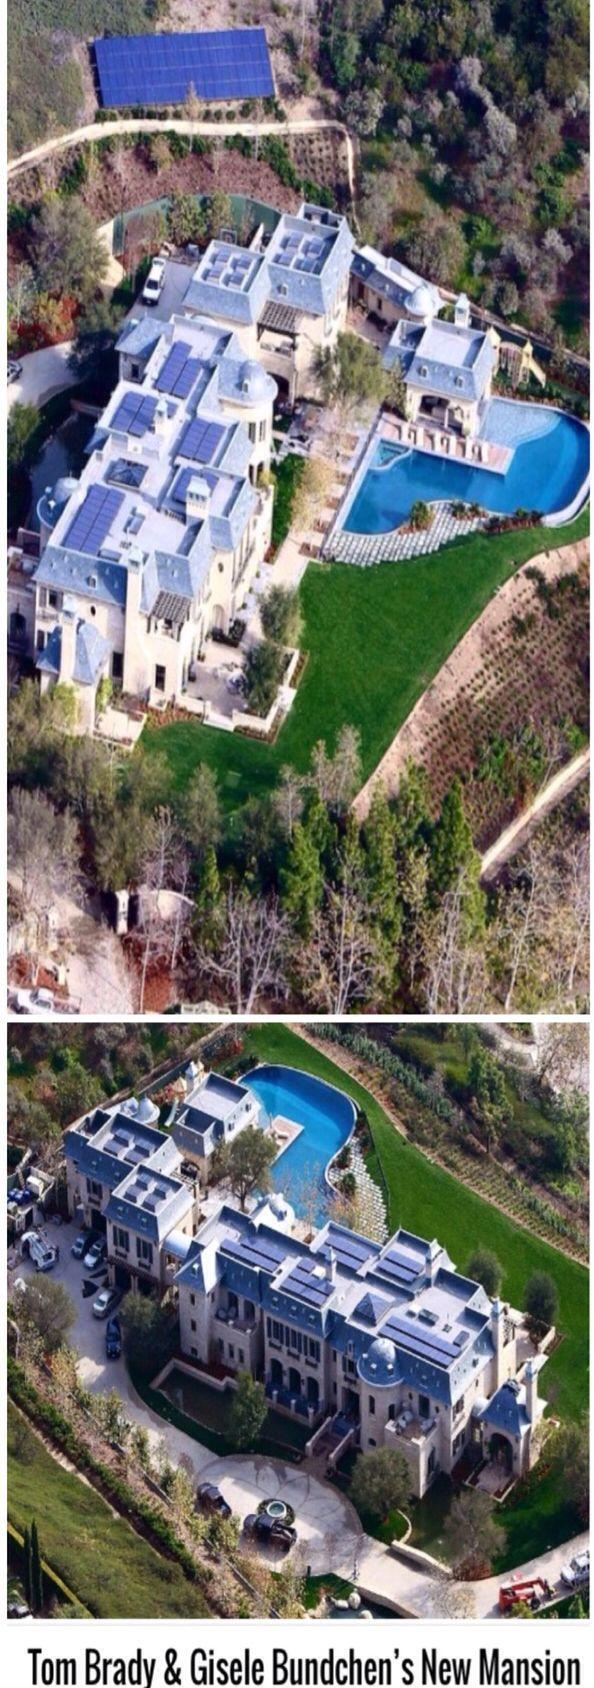 Tom Brady & wife Gisele Bundchen' s new Luxury Mansion